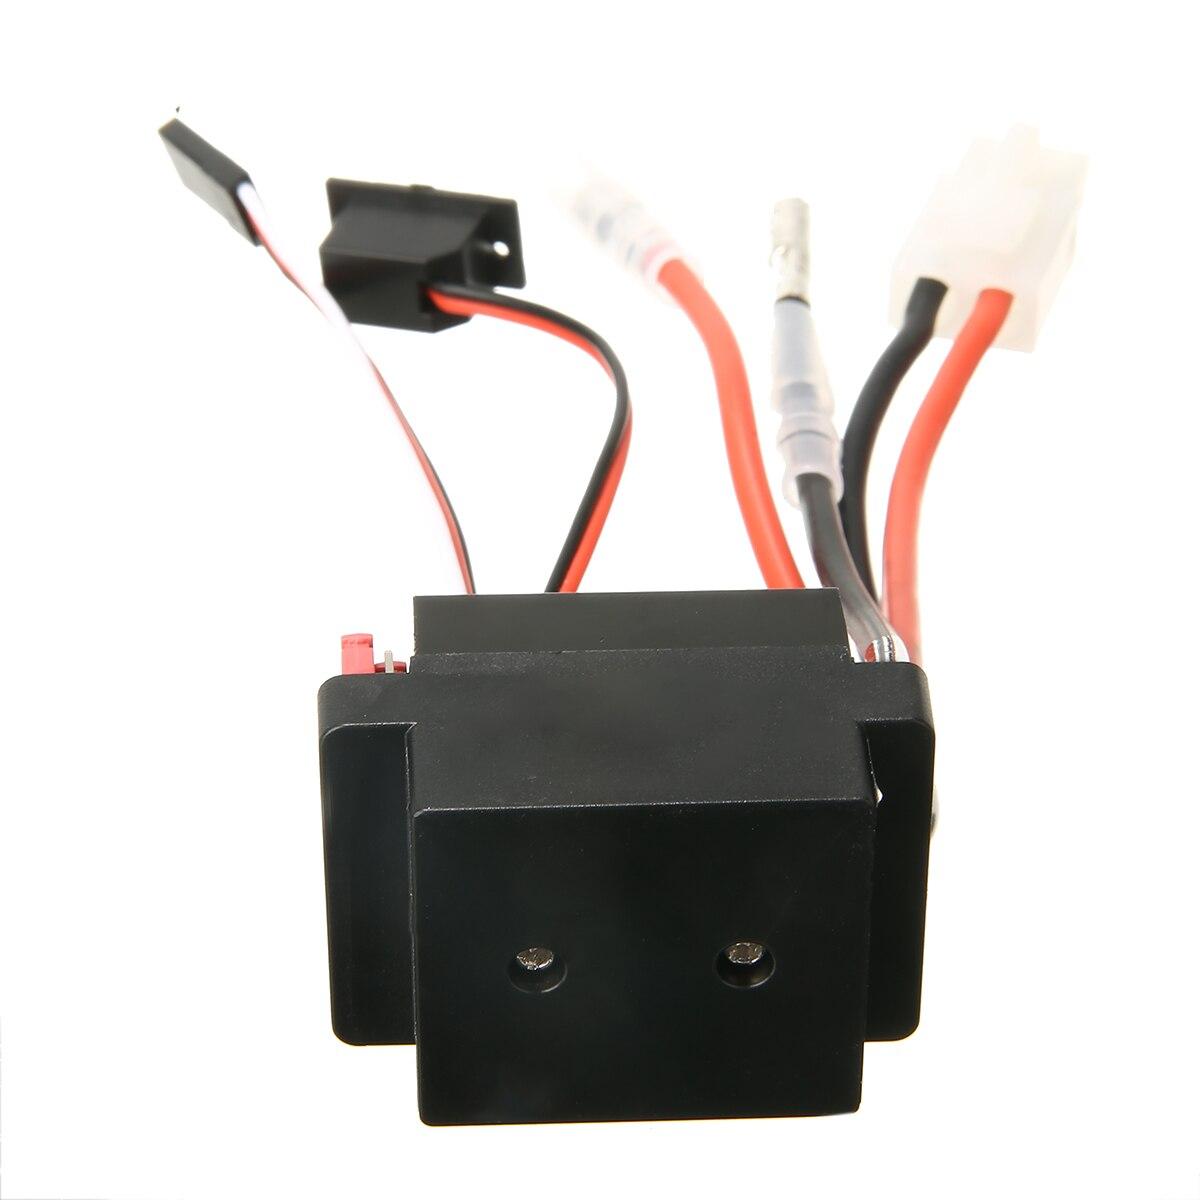 For RC Car Boat 1PC High Voltage ESC Brushed Motor Speed Controller 320A 7.4V-11.1V MAYITR